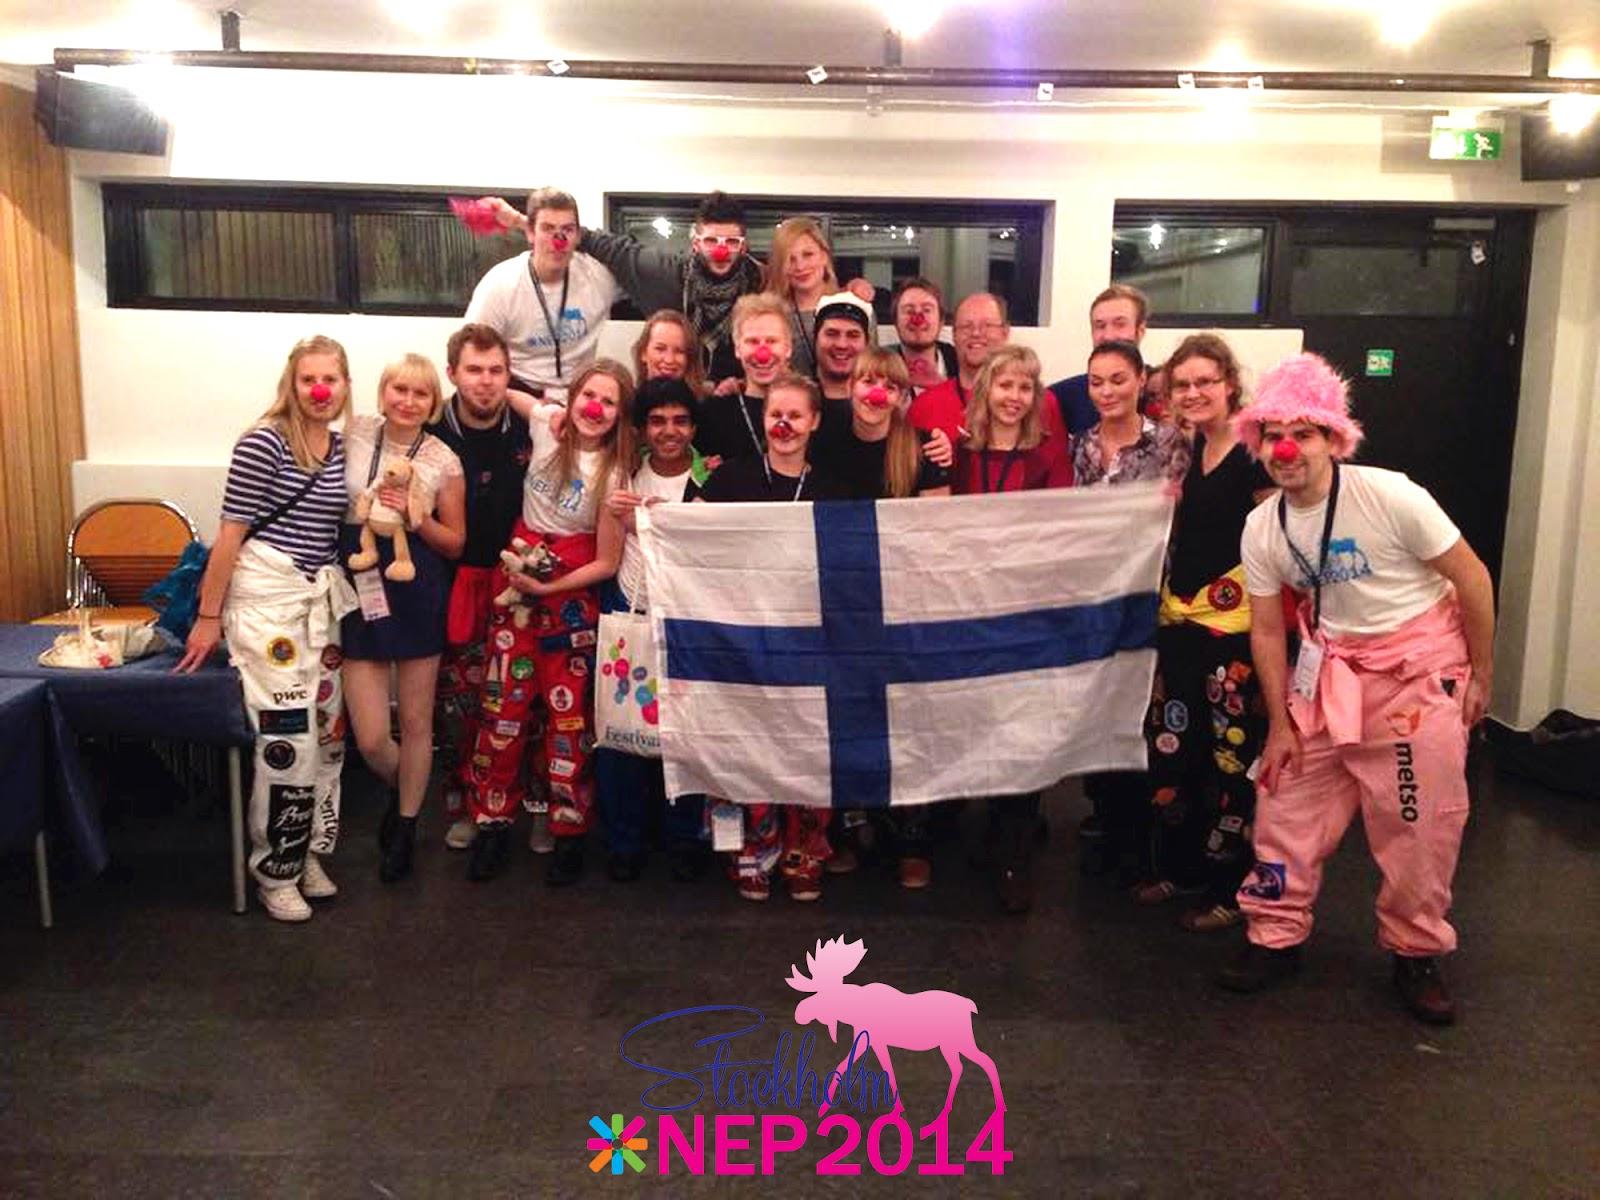 finland_delegation copy.jpg